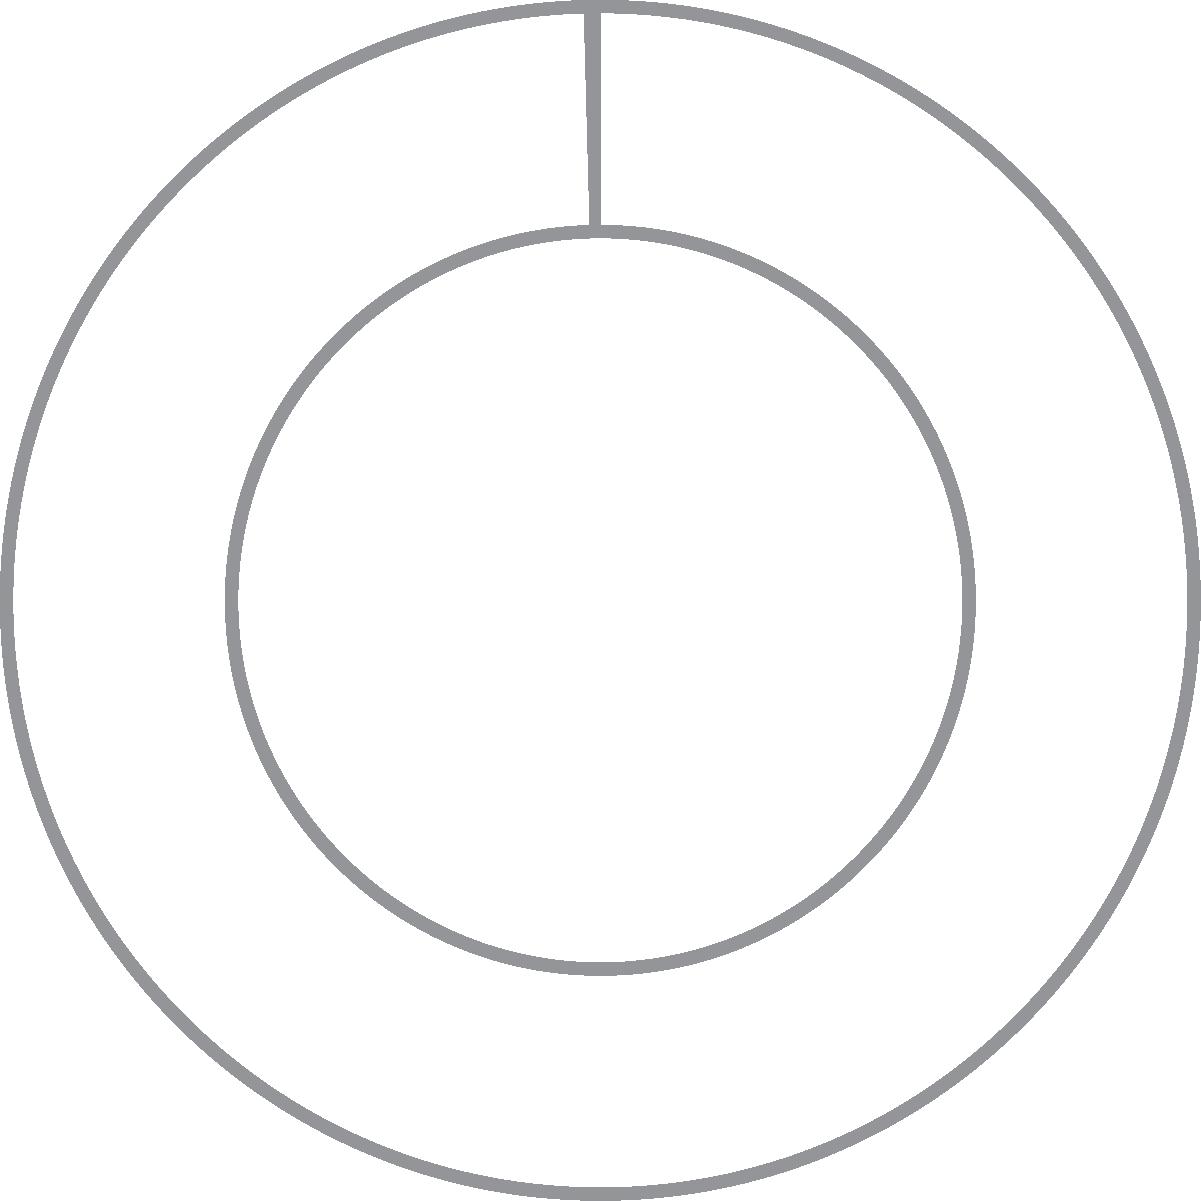 Donut Chart 0.43%